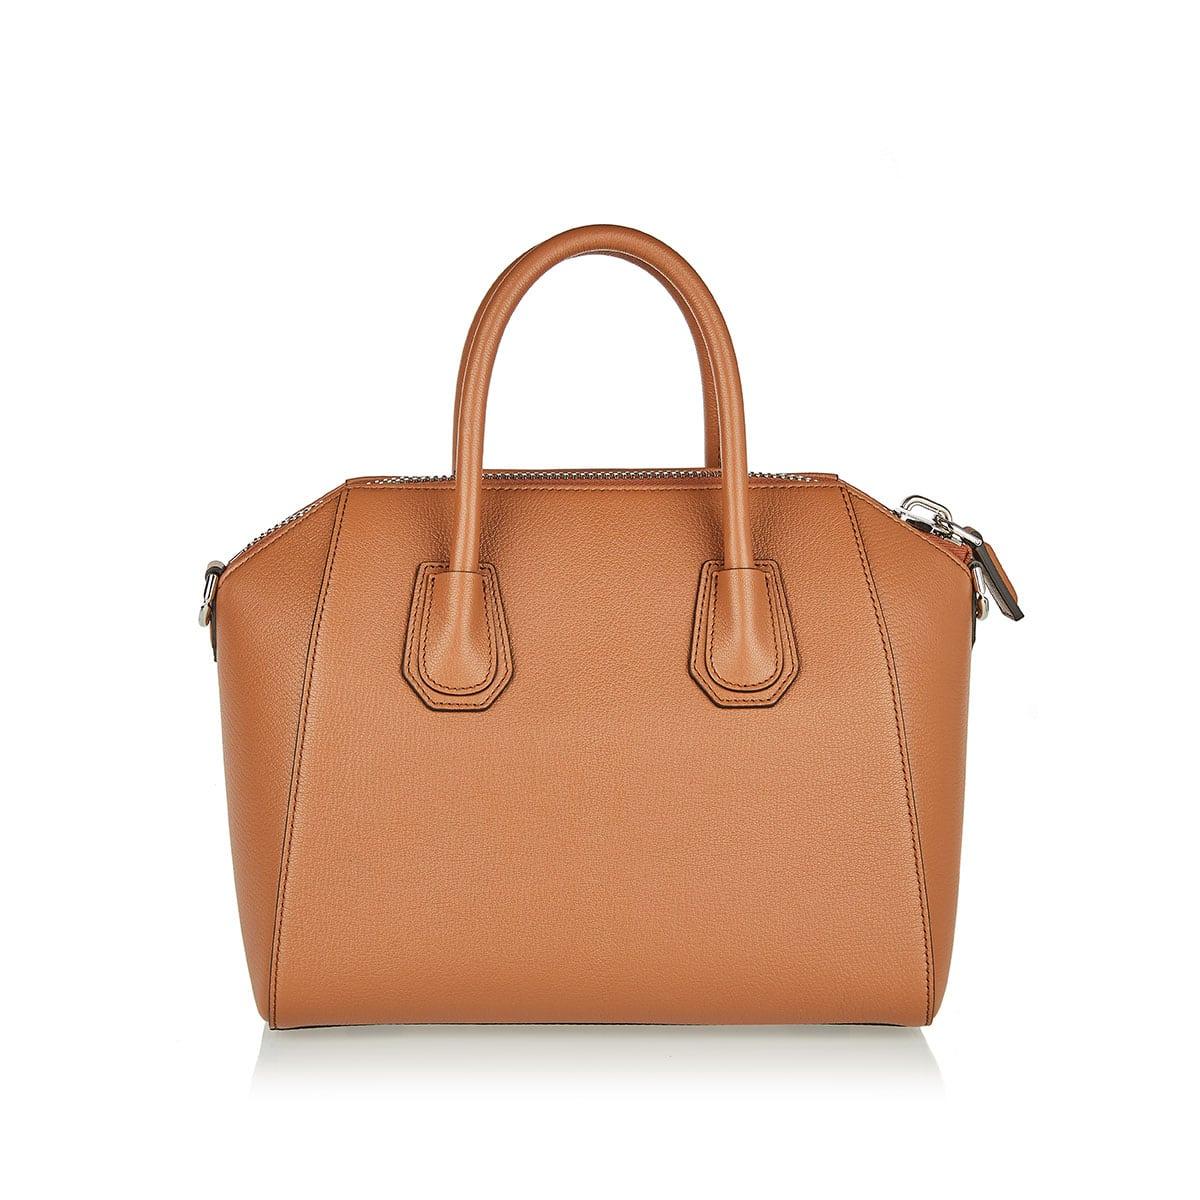 Small Antigona bag